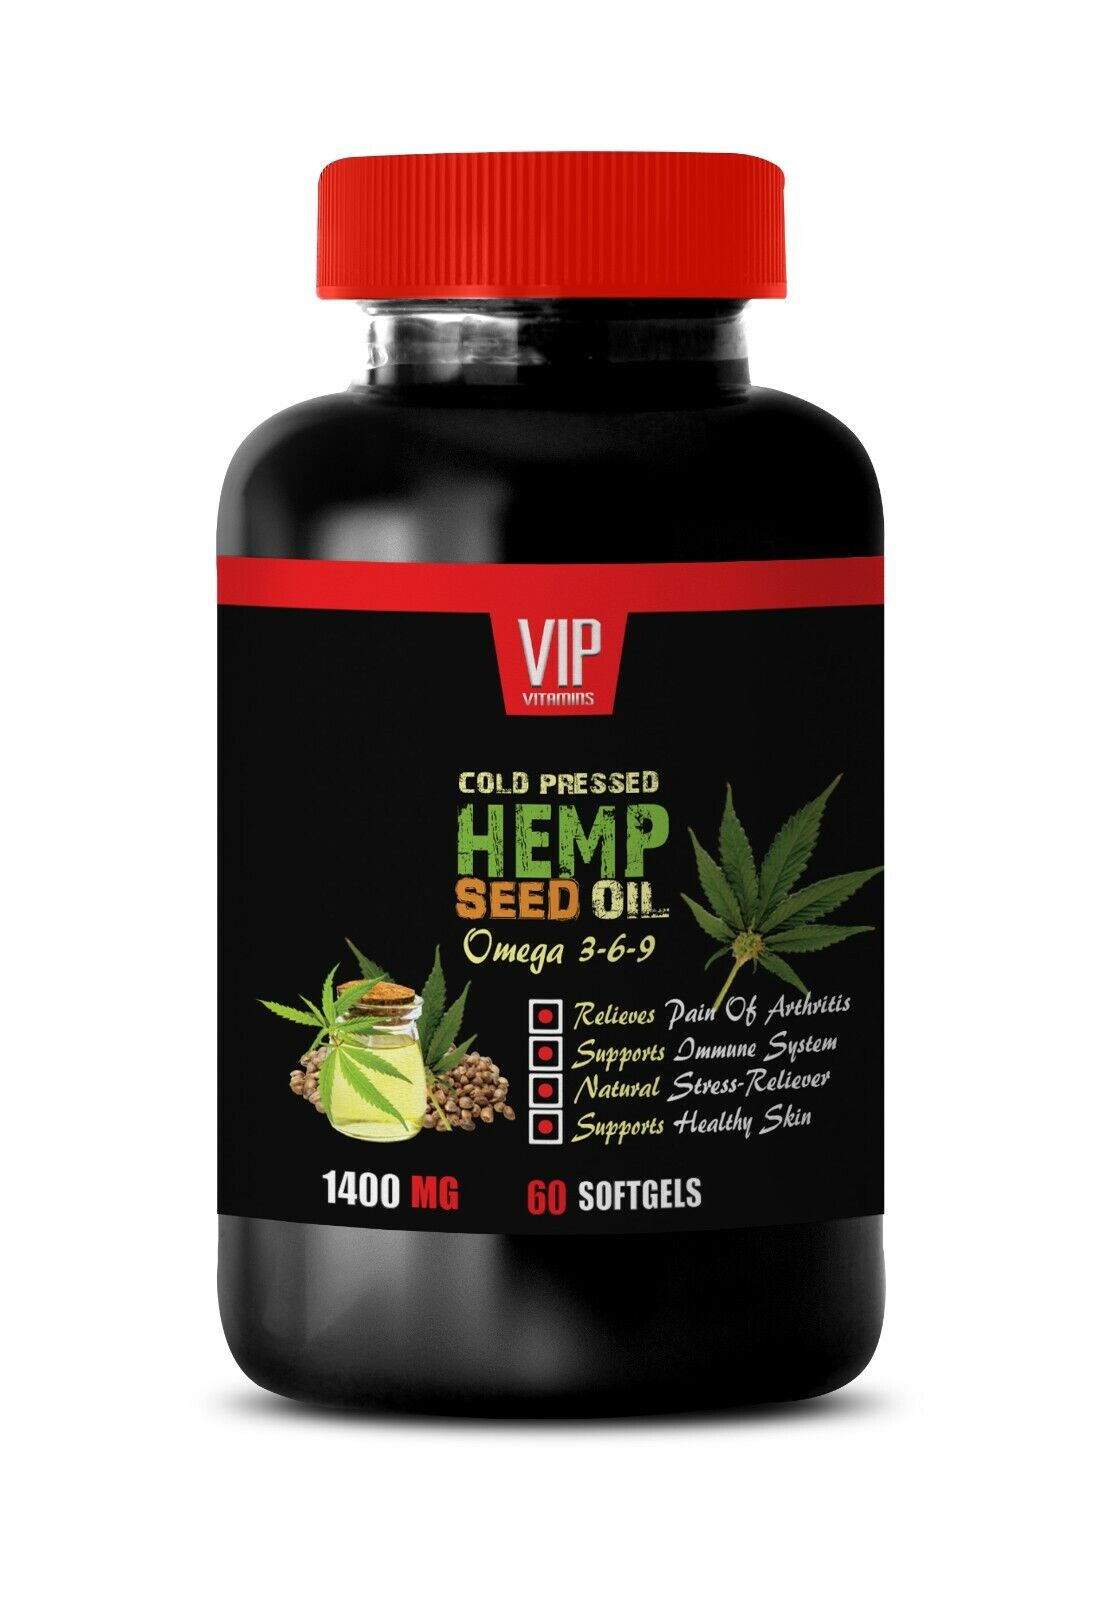 hemp salve - Hemp Seed Oil 1400mg (1) - balance hormones naturally